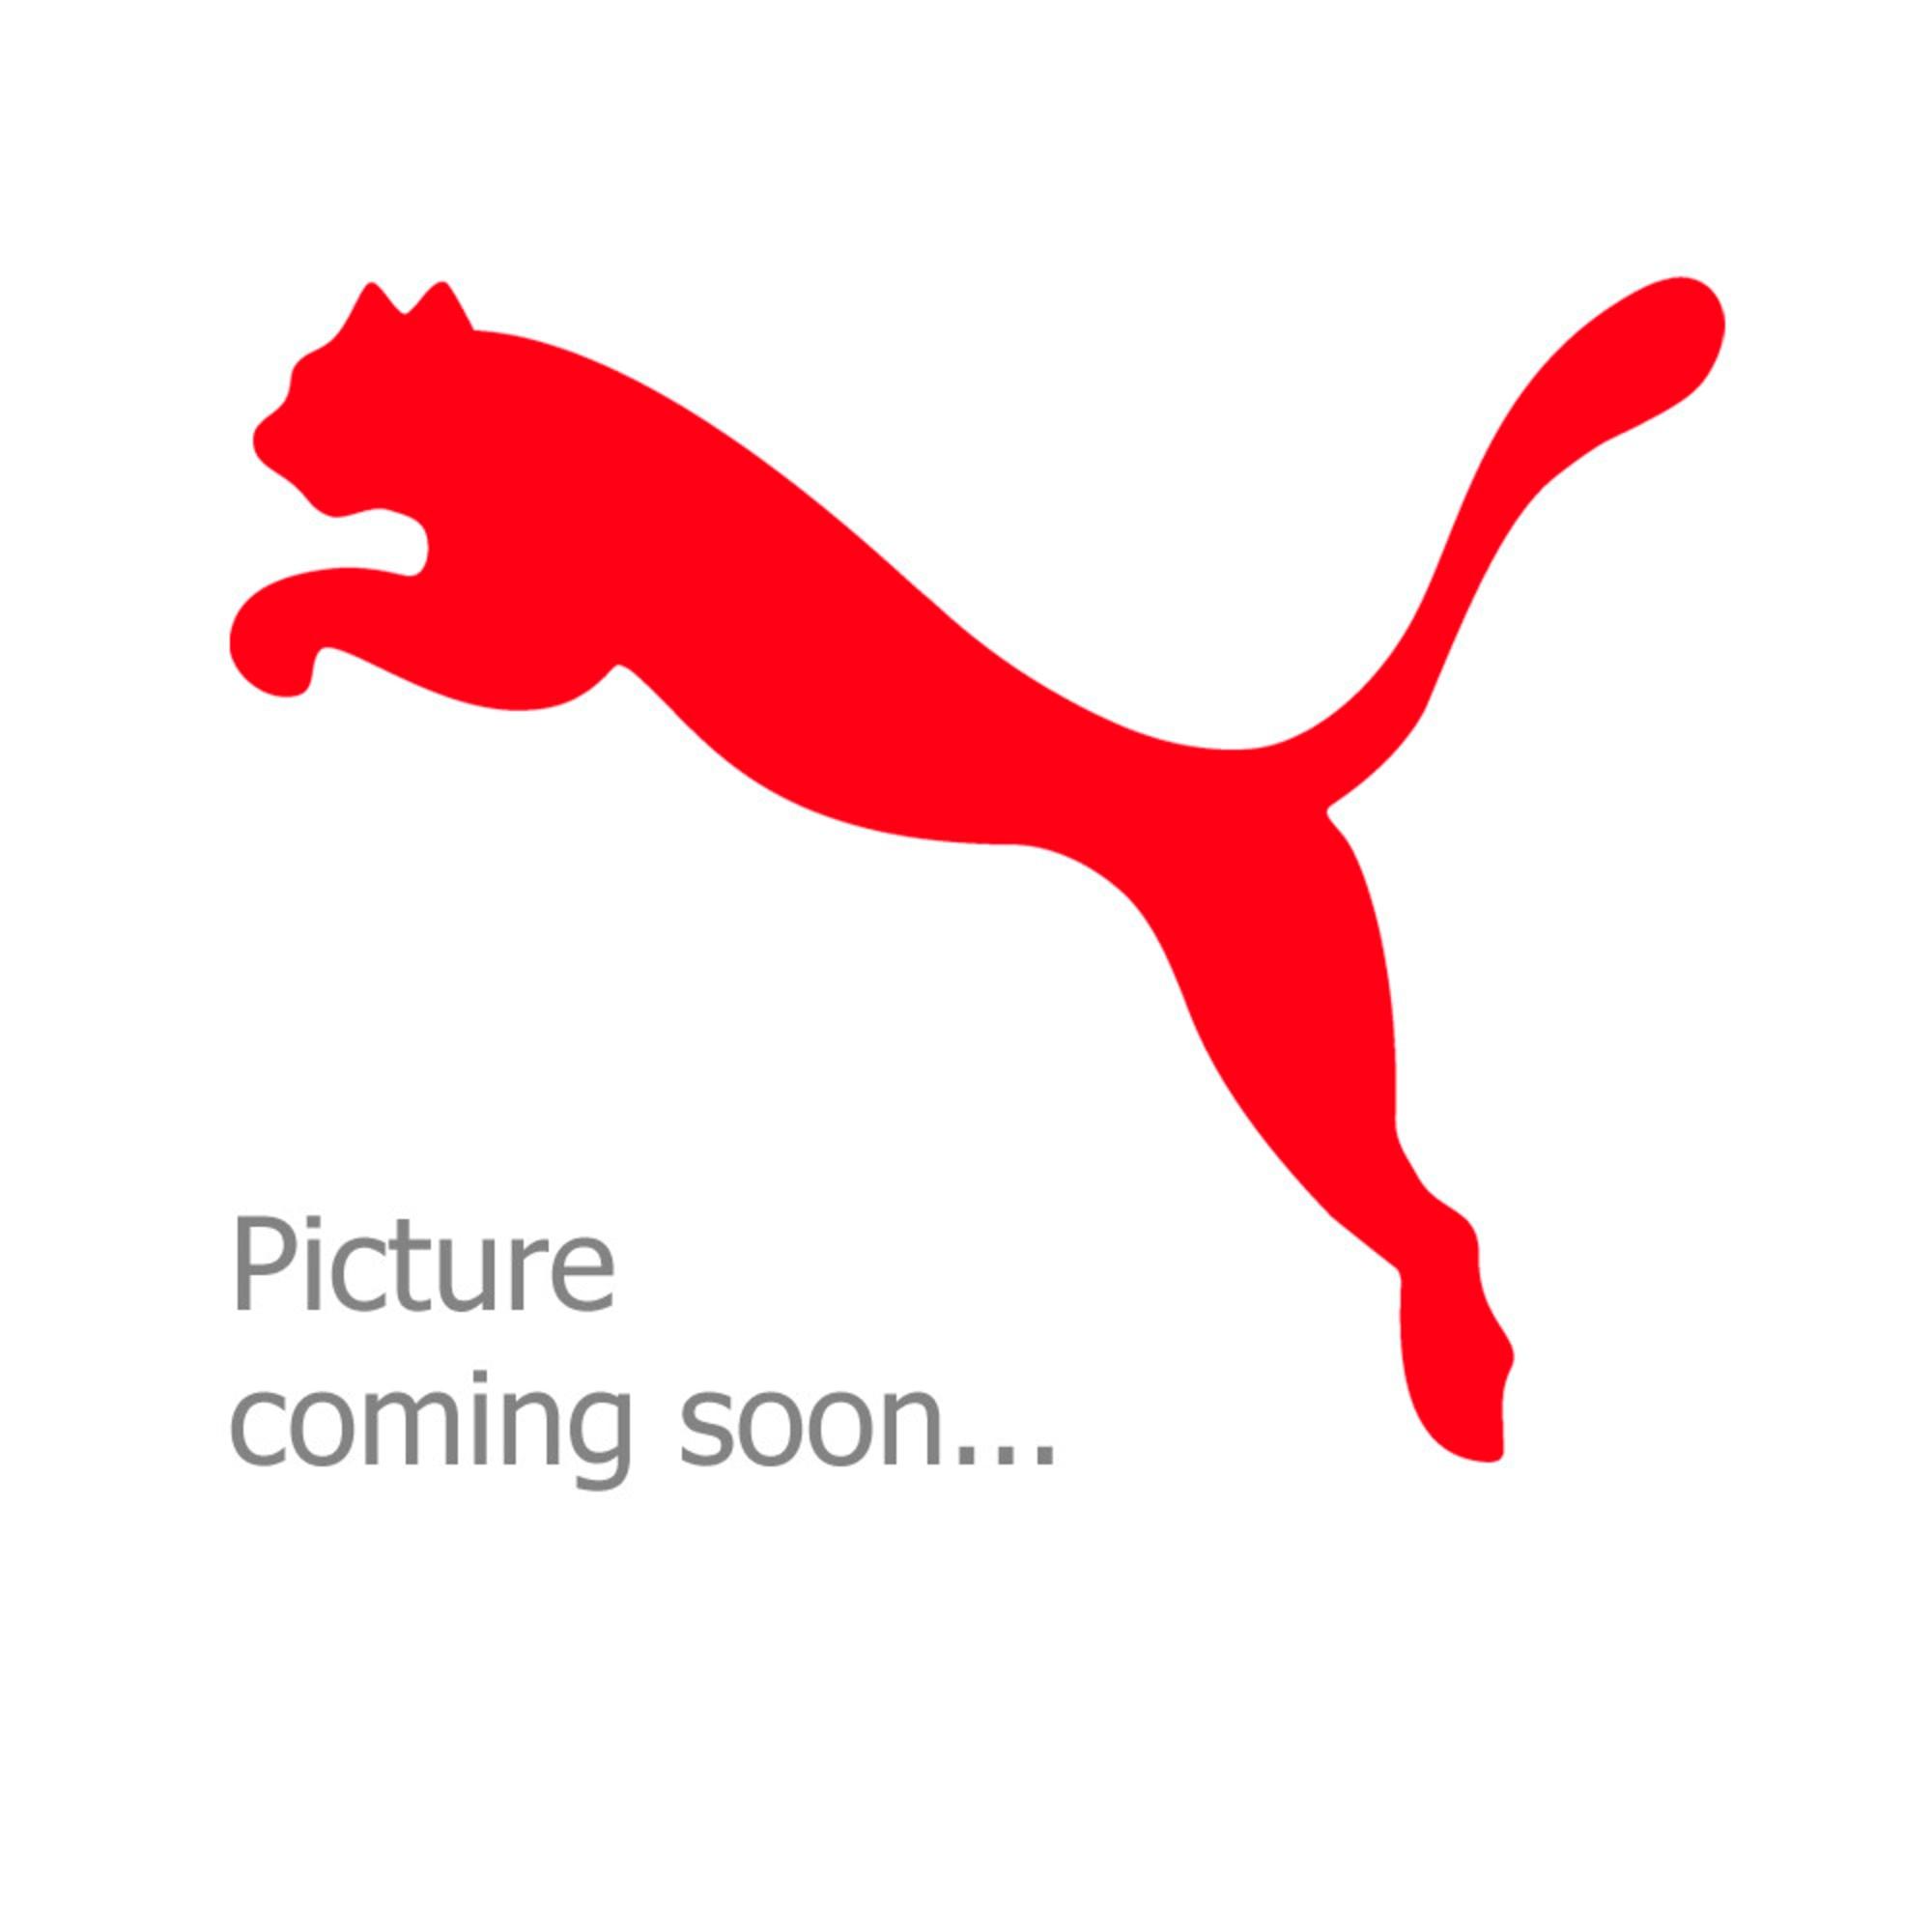 Thumbnail 8 of CALI ウィメンズ, Puma White-Puma Black, medium-JPN